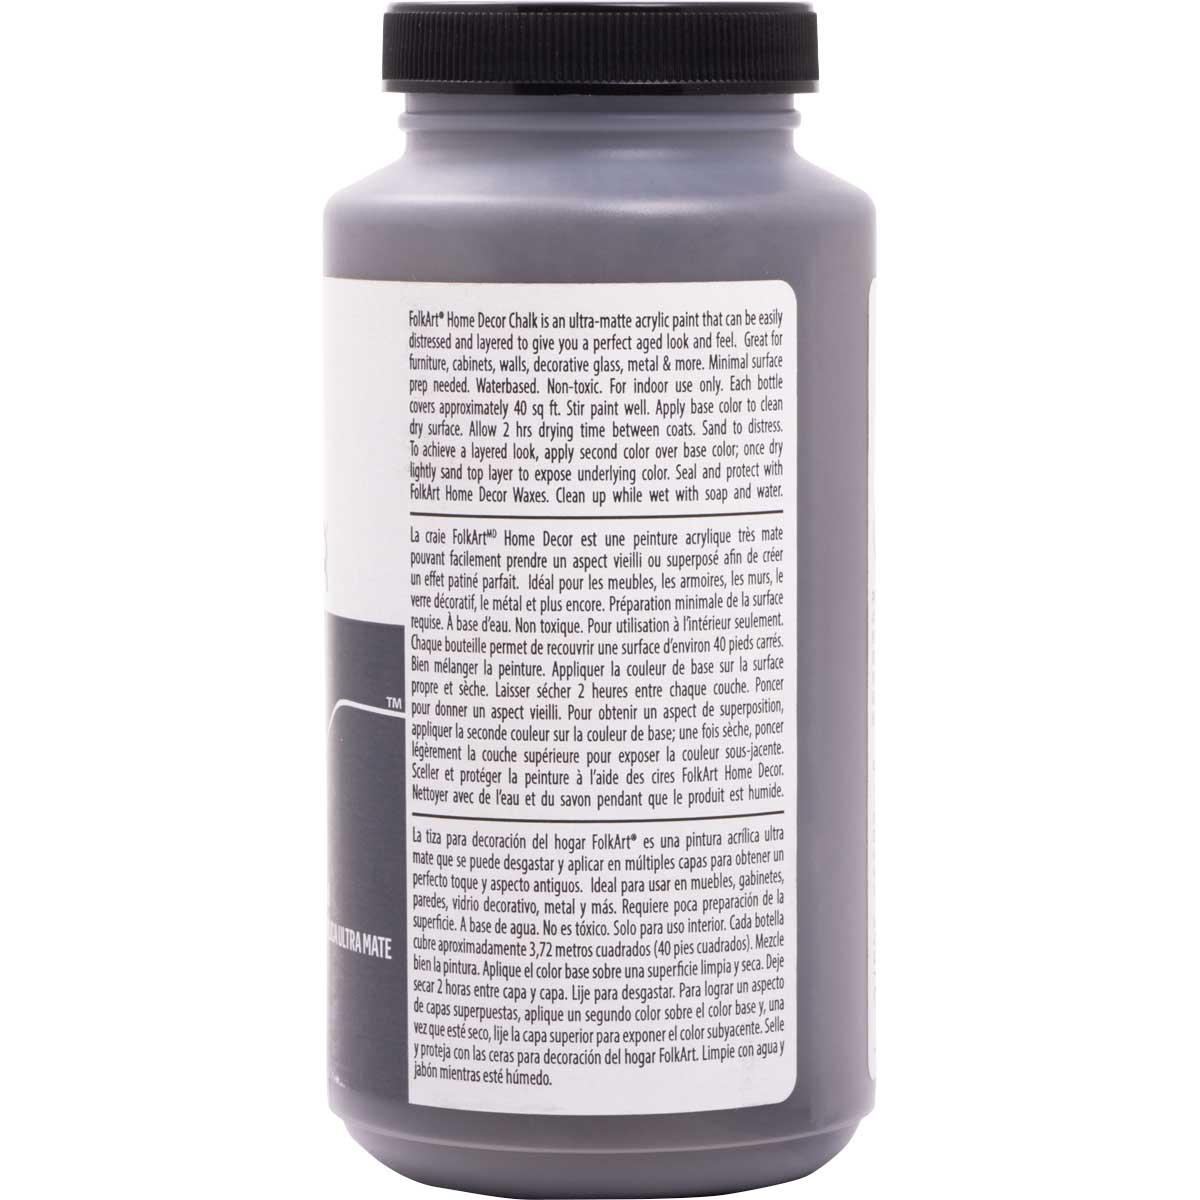 FolkArt ® Home Decor™ Chalk - Maui Sand, 16 oz. - 34876